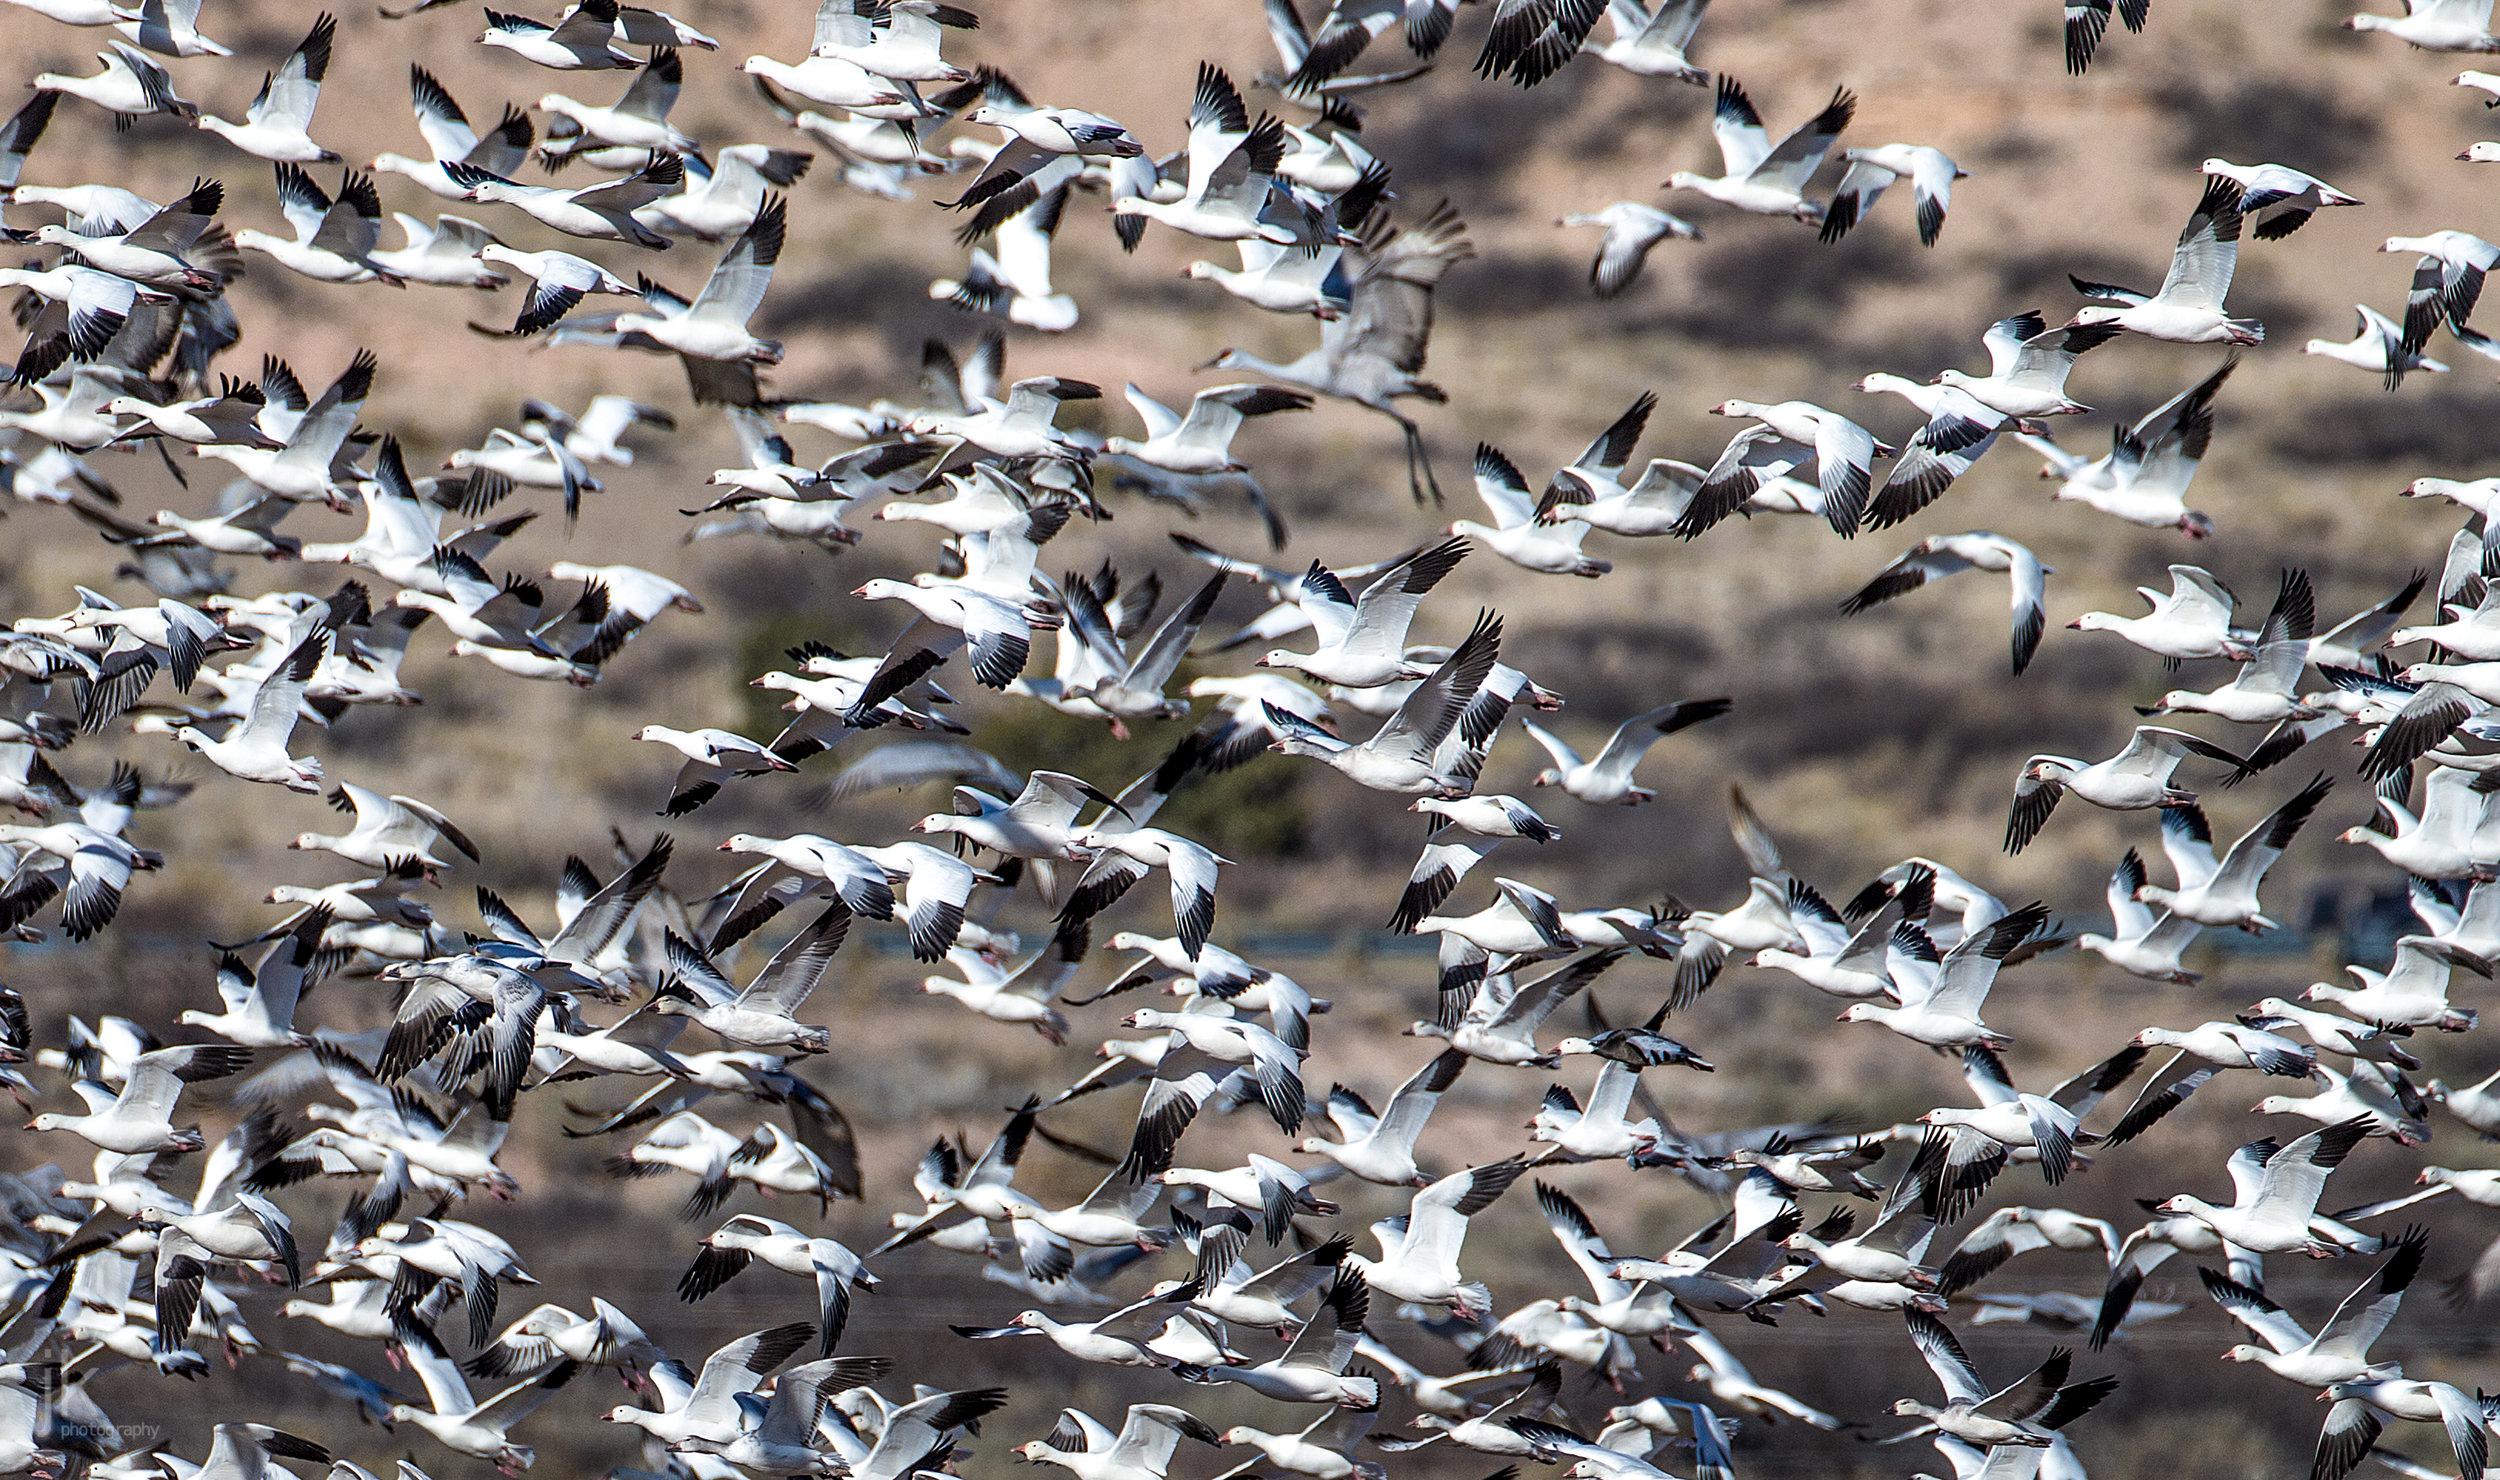 20180410-birds=jkp-11.jpg